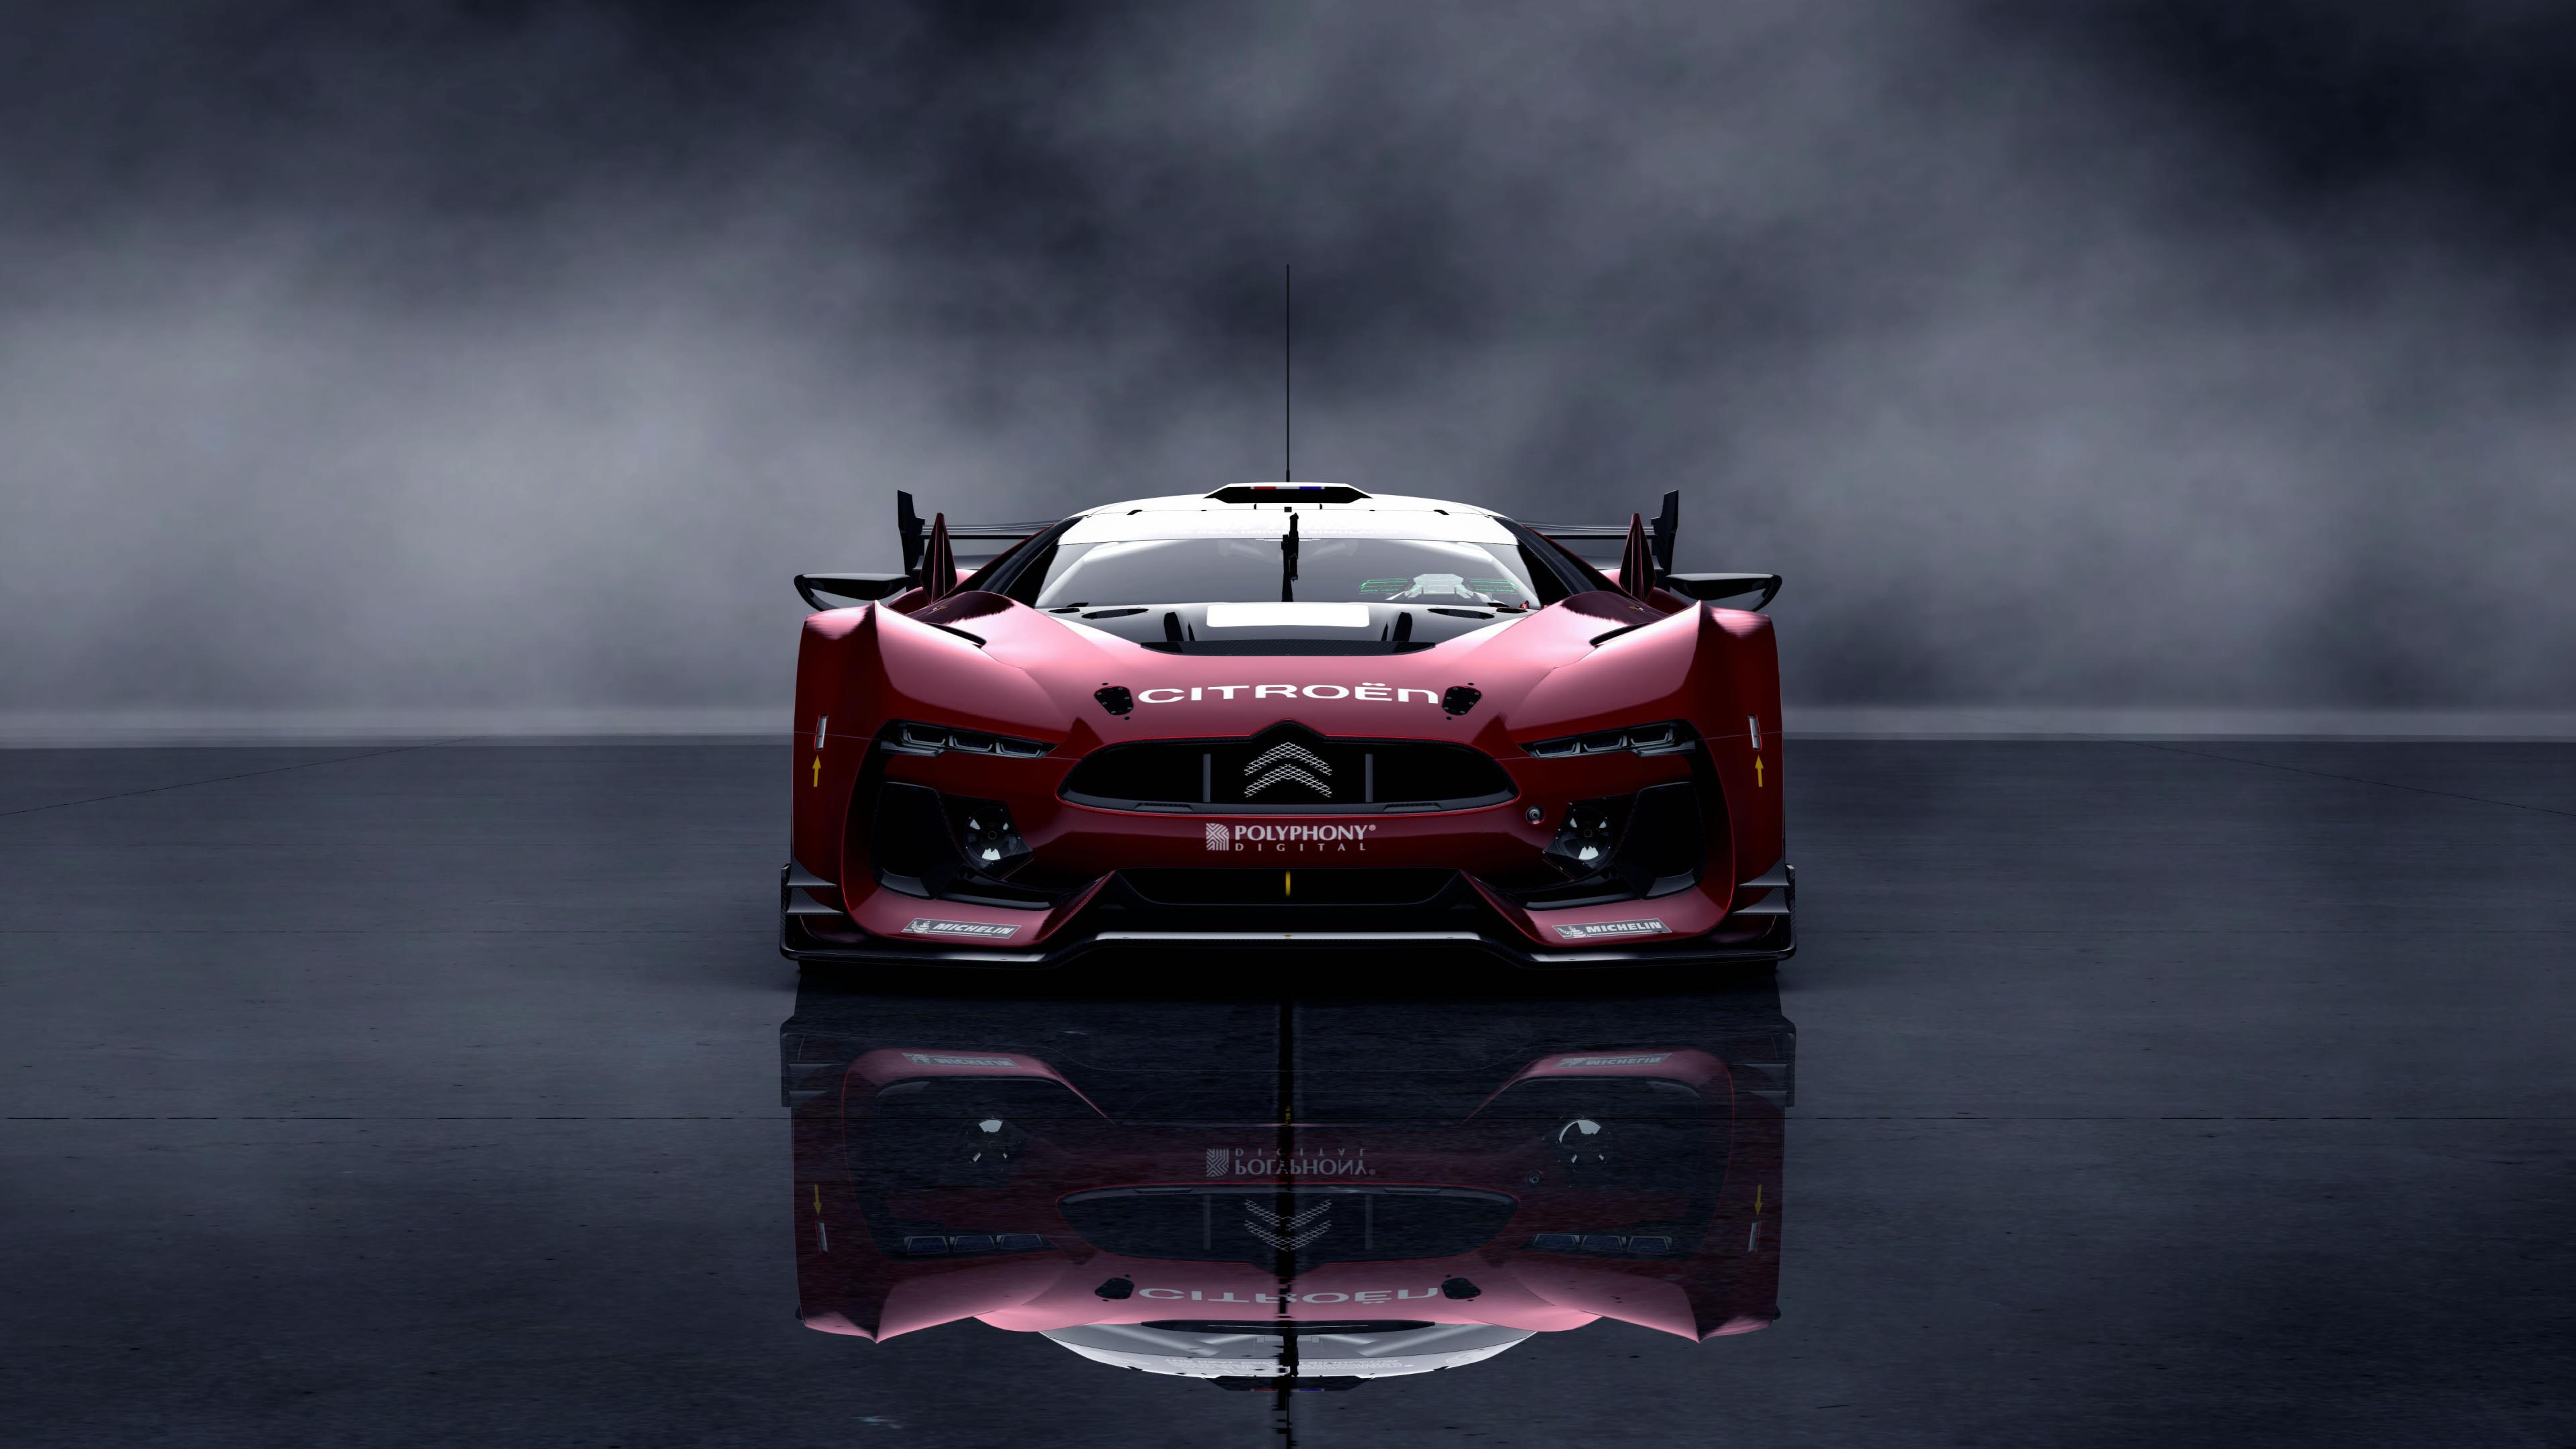 citroen_gt_race_car-4K